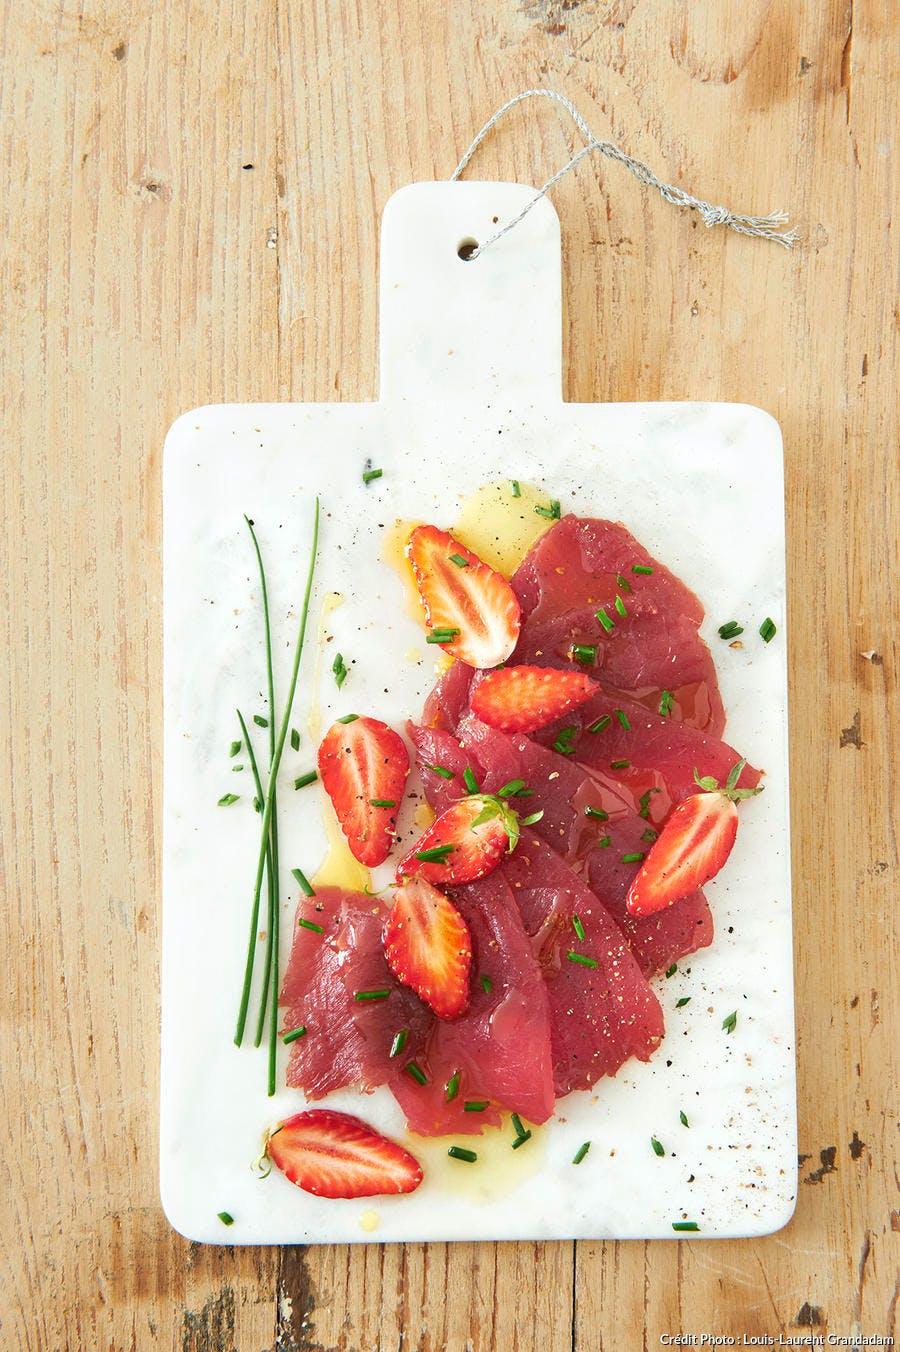 r59_thon-juste-tiede-fraises_lg.jpg